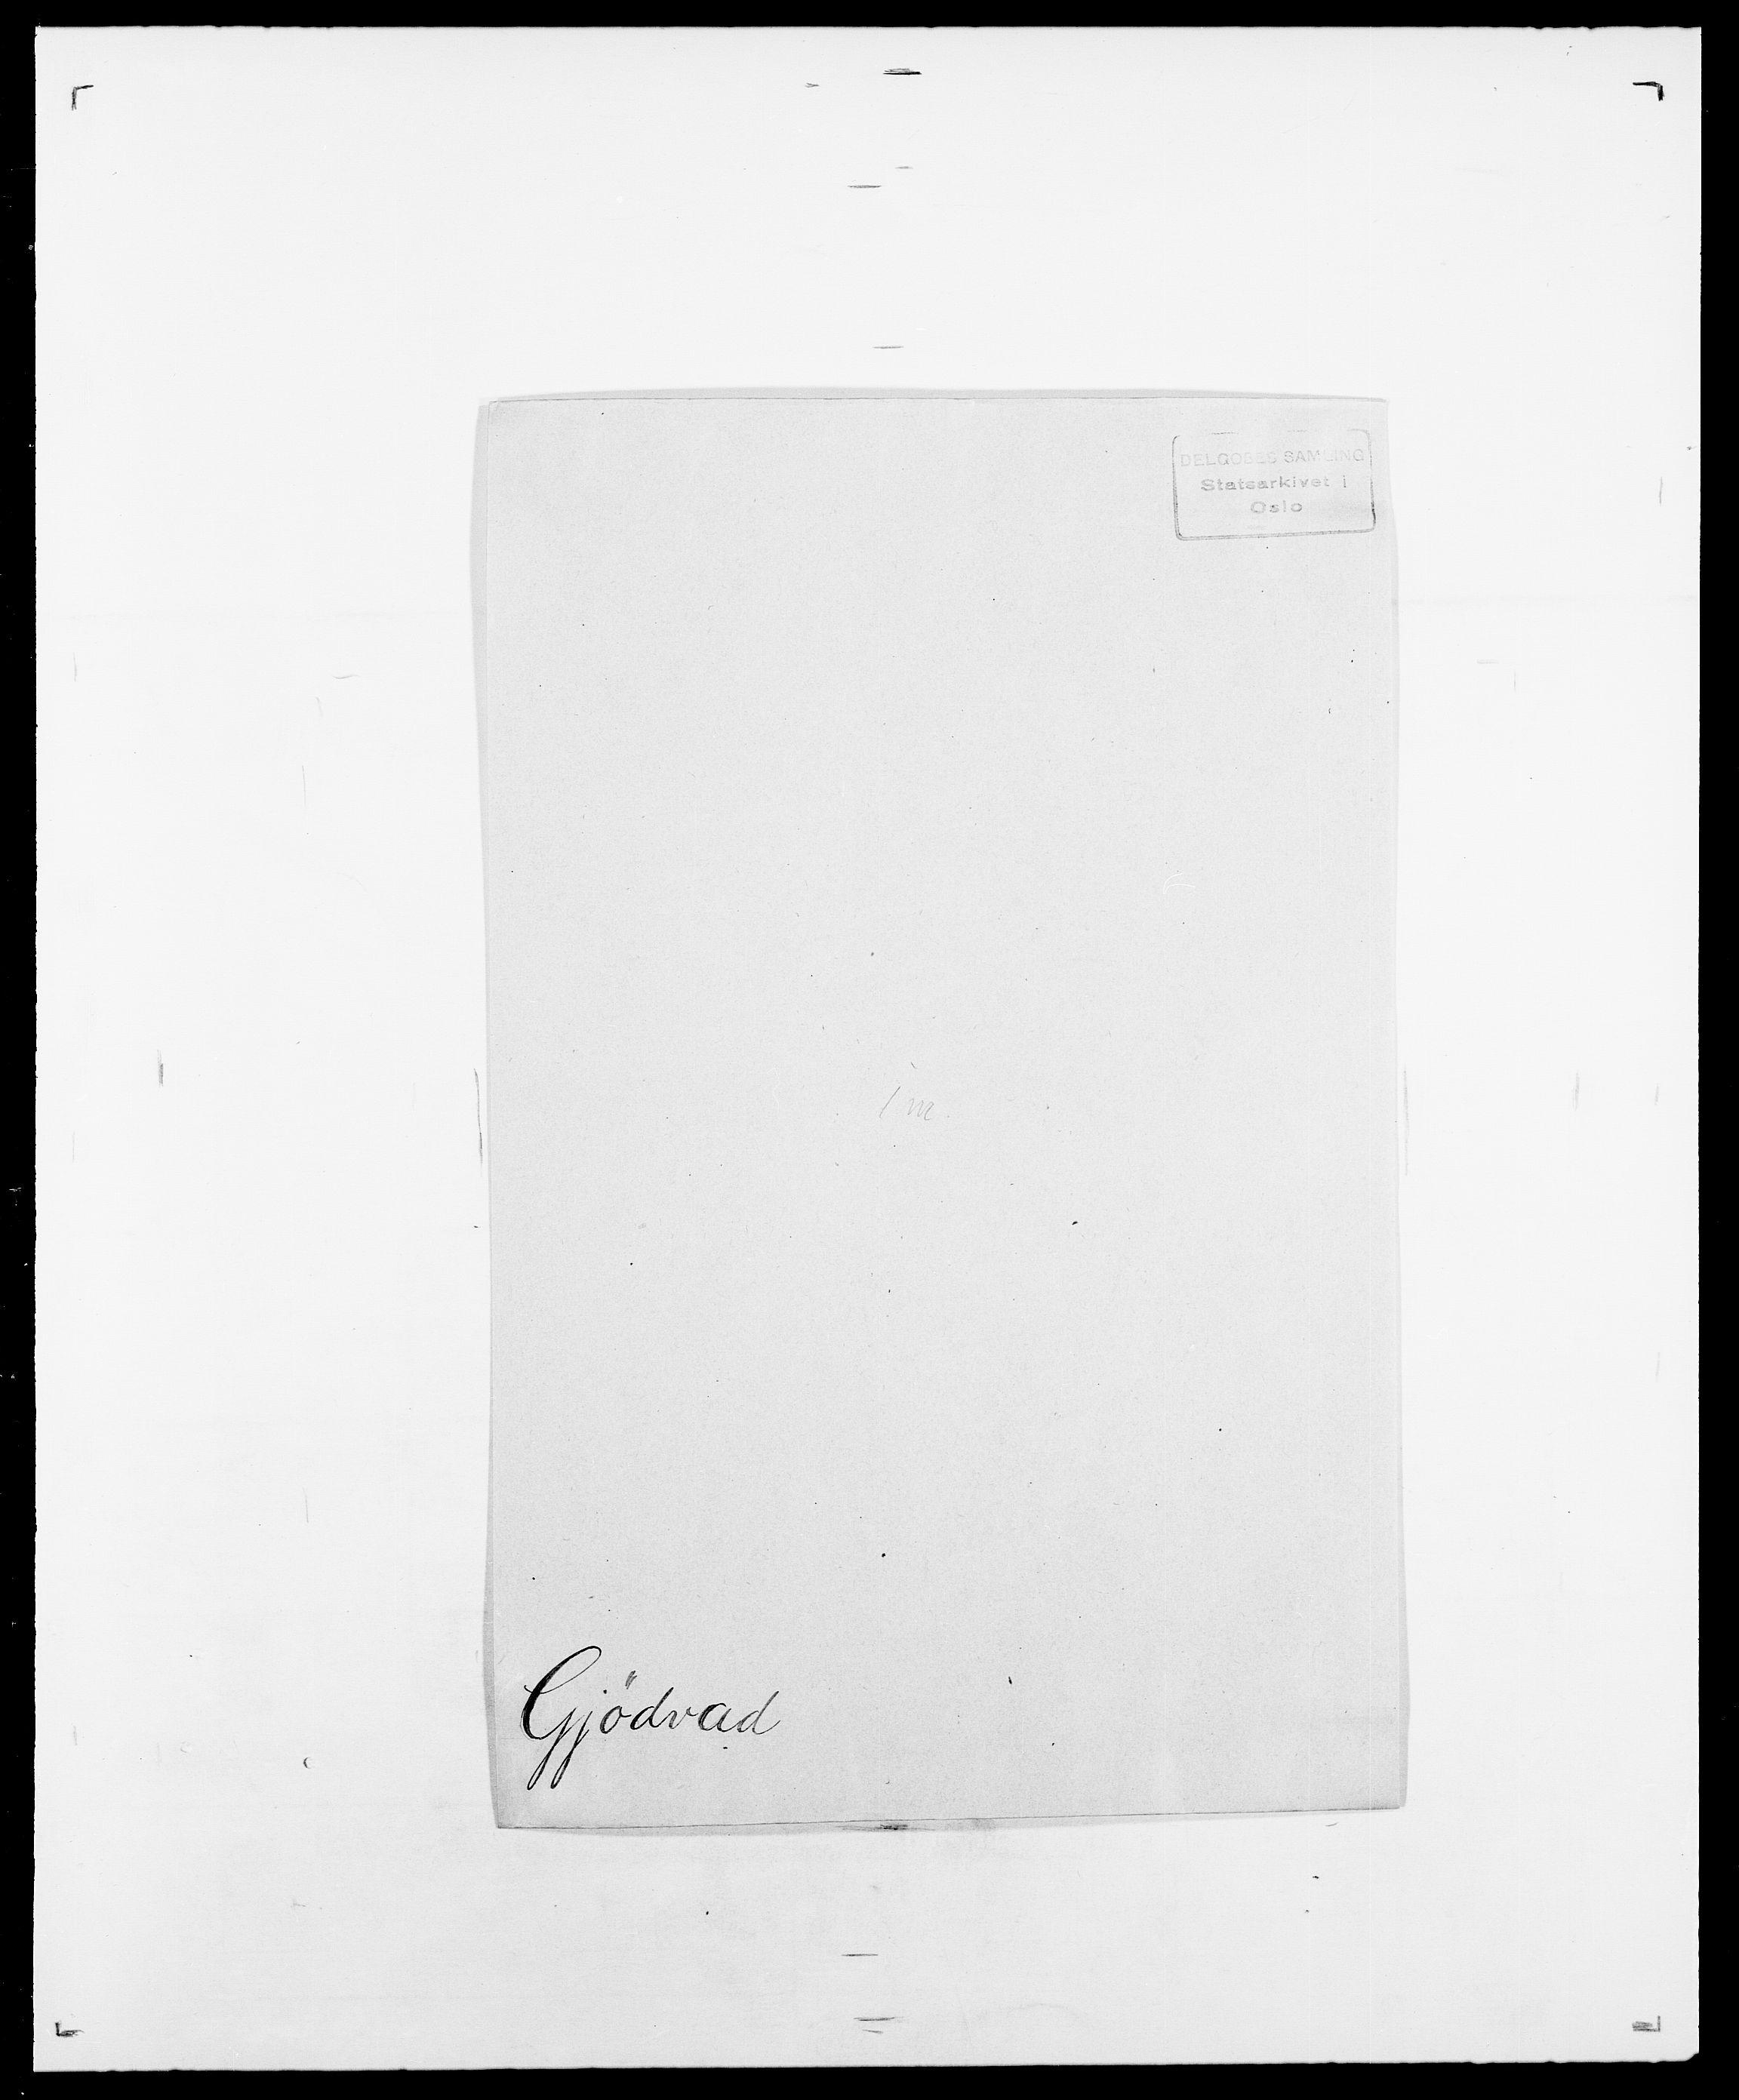 SAO, Delgobe, Charles Antoine - samling, D/Da/L0014: Giebdhausen - Grip, s. 206